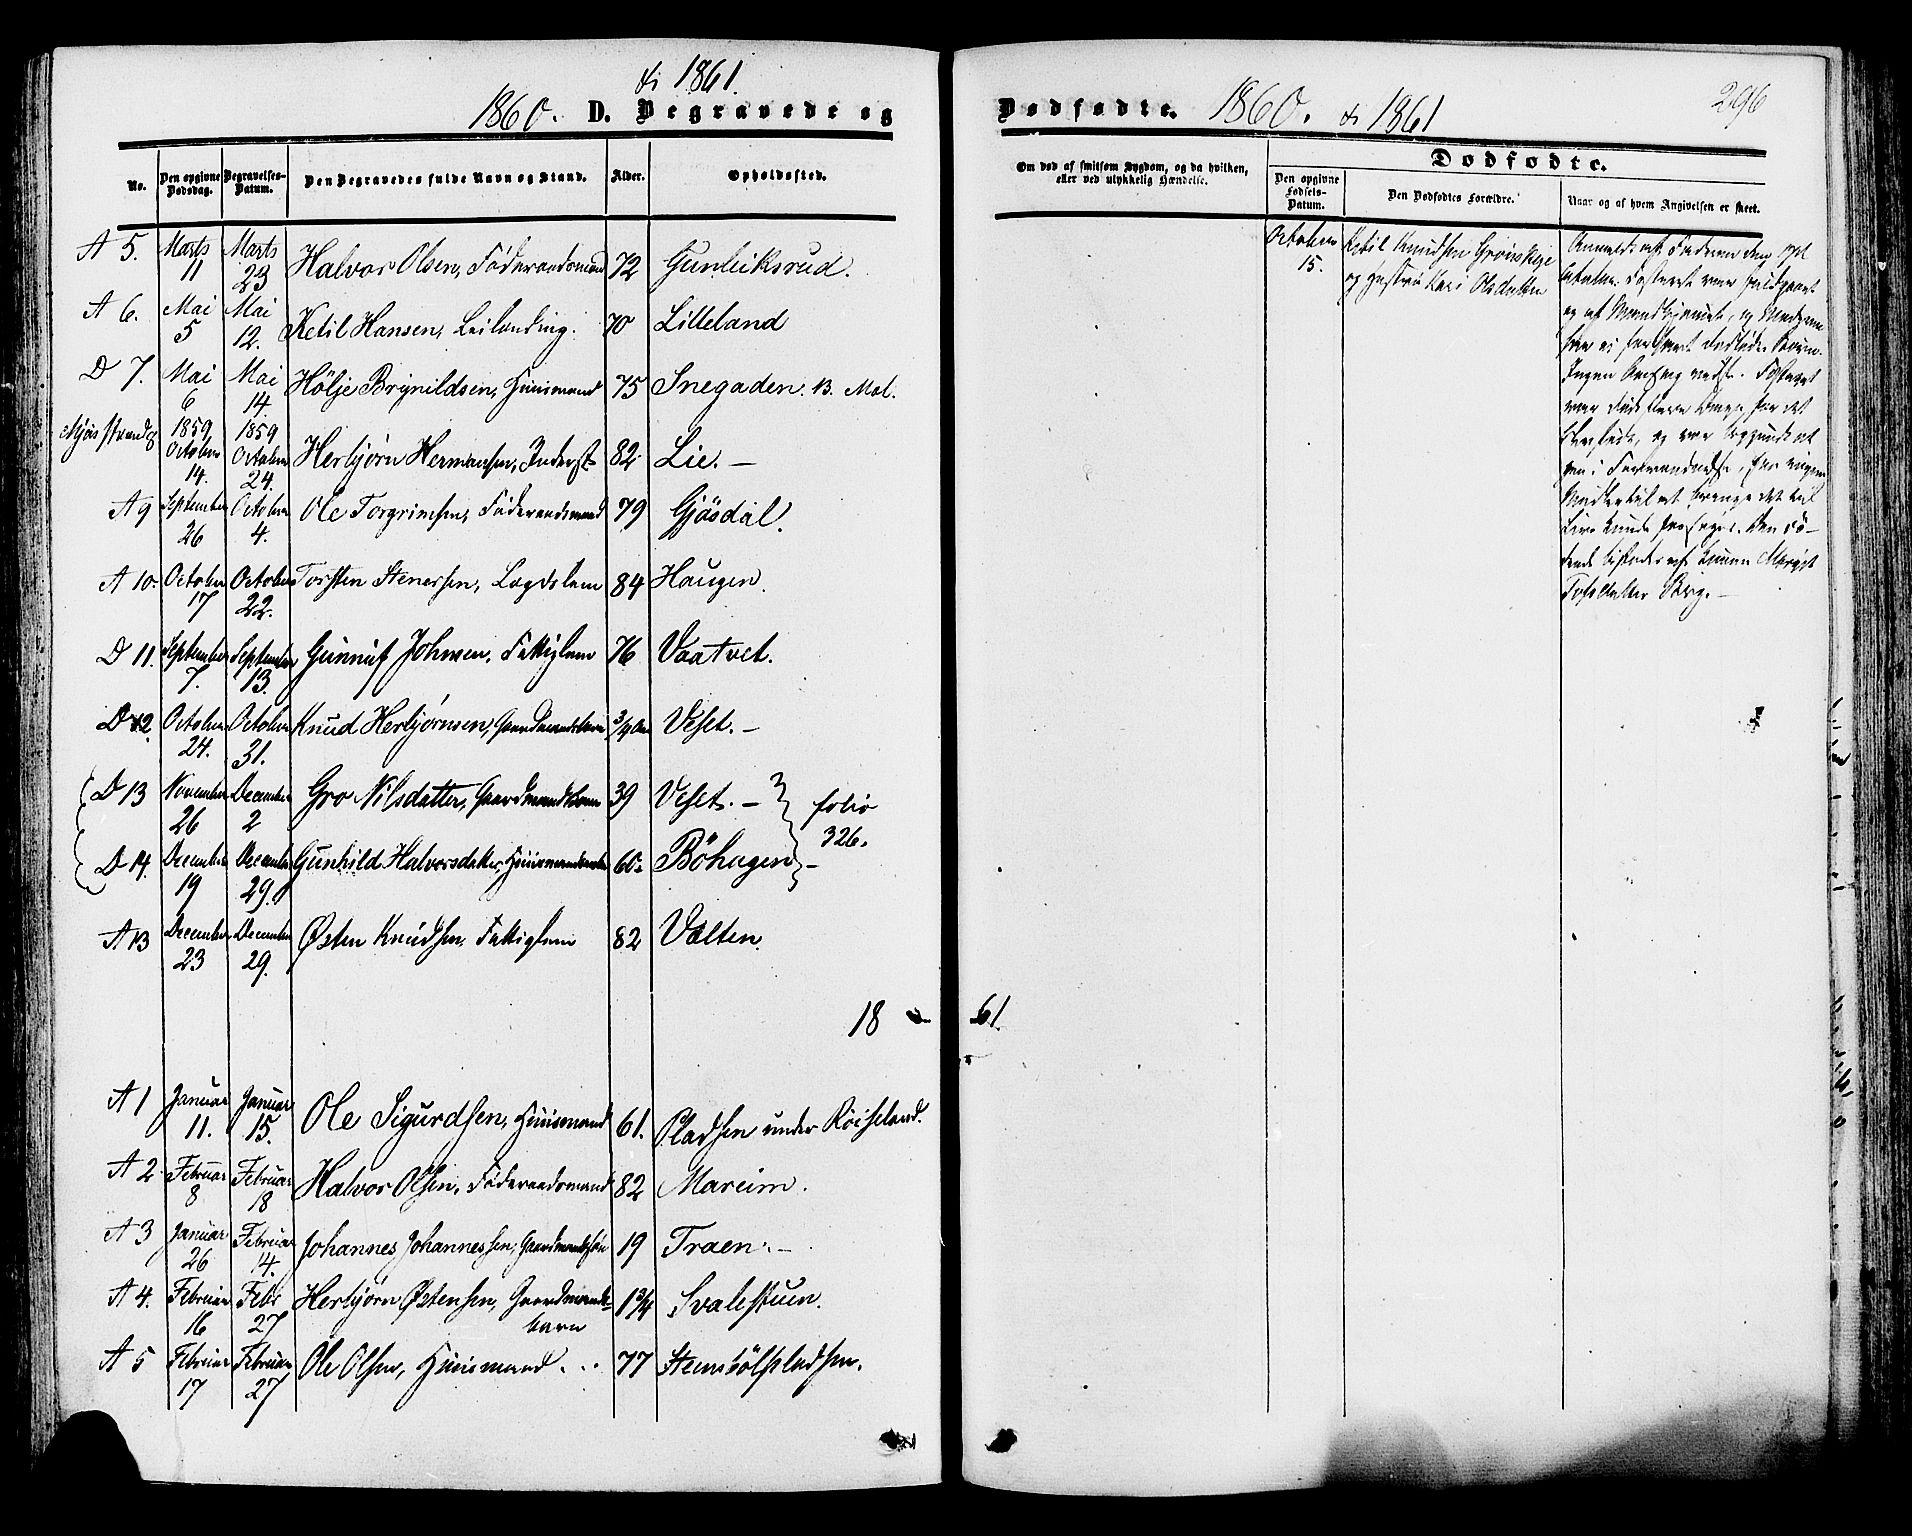 SAKO, Tinn kirkebøker, F/Fa/L0006: Ministerialbok nr. I 6, 1857-1878, s. 296